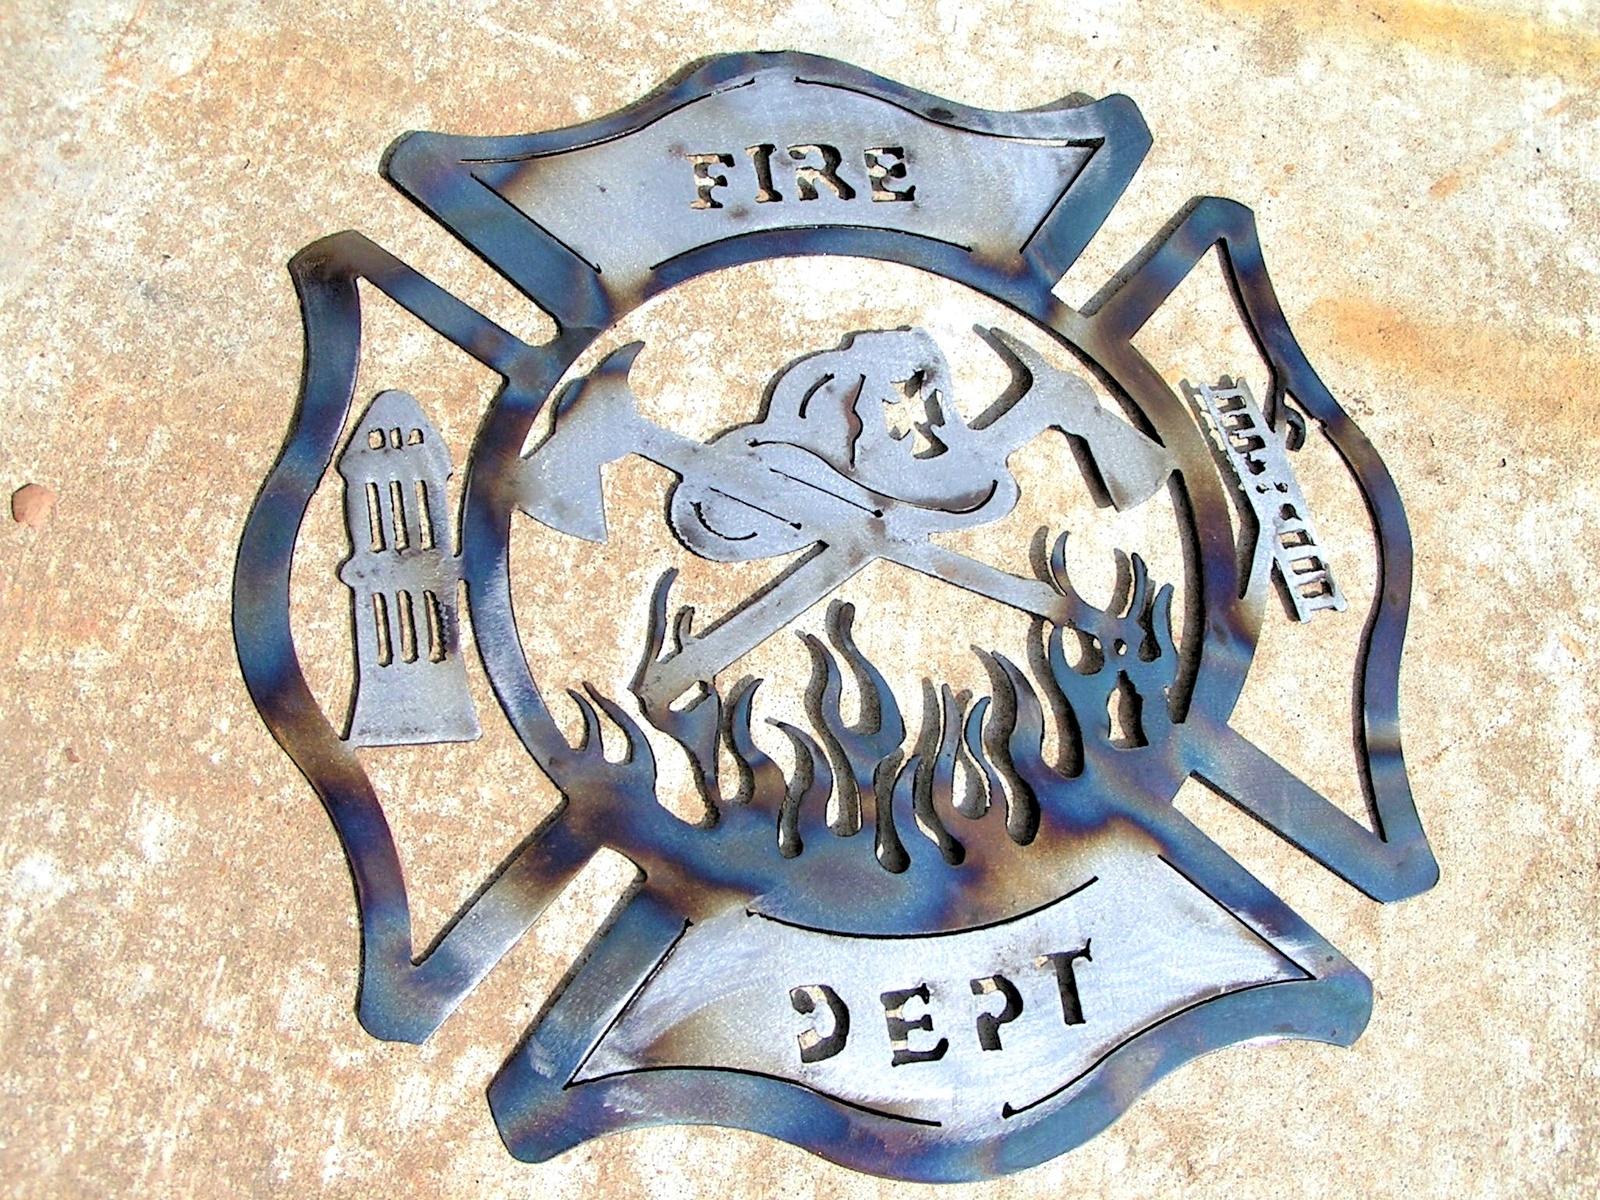 Firefighter Maltese Cross Sandstone Coasters Metal Holder /& Soft Car Coaster